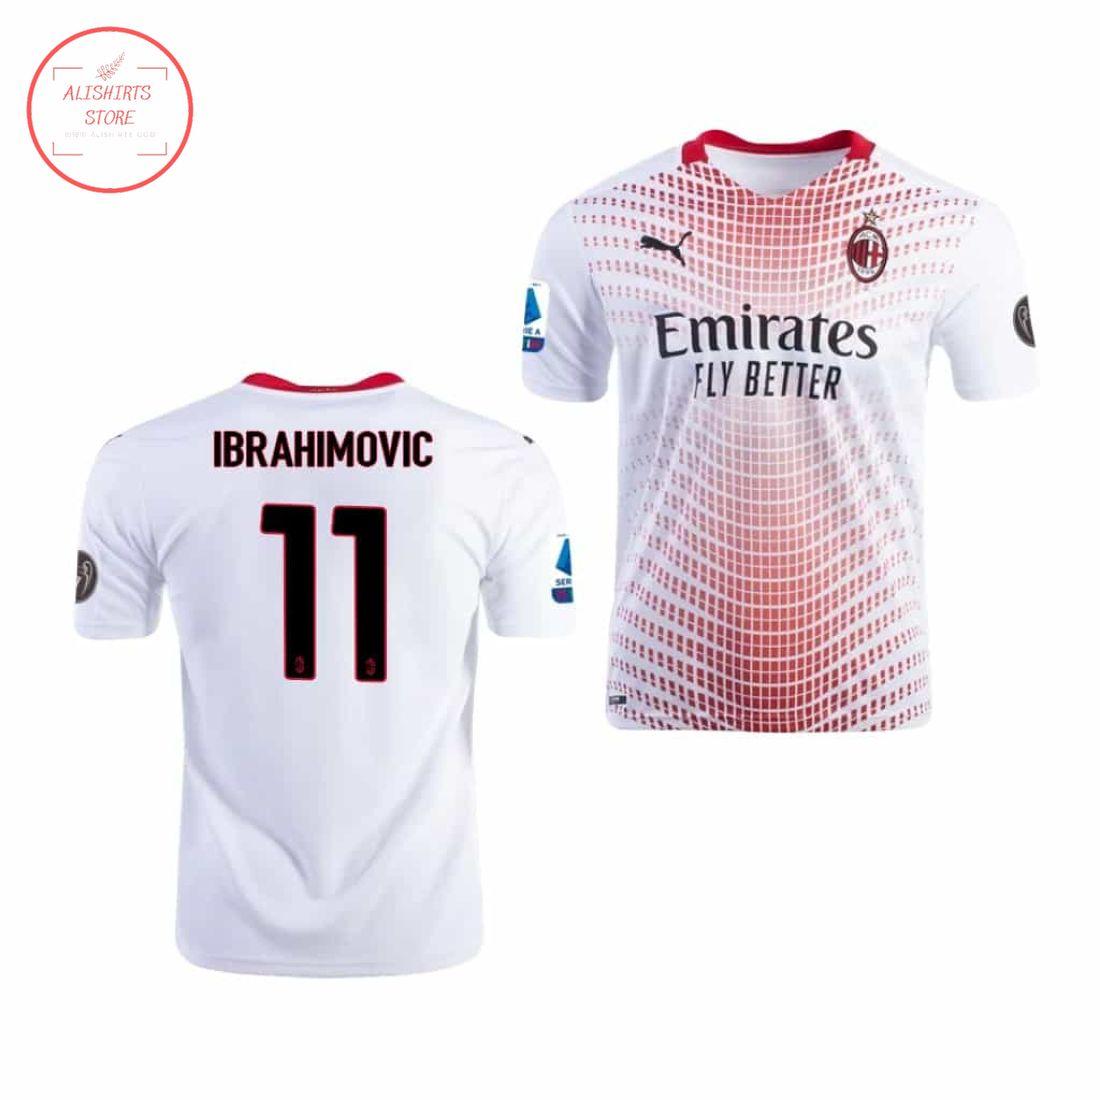 Zlatan Ibrahimovic Ac Milan Home Jersey Italian Cup 2021